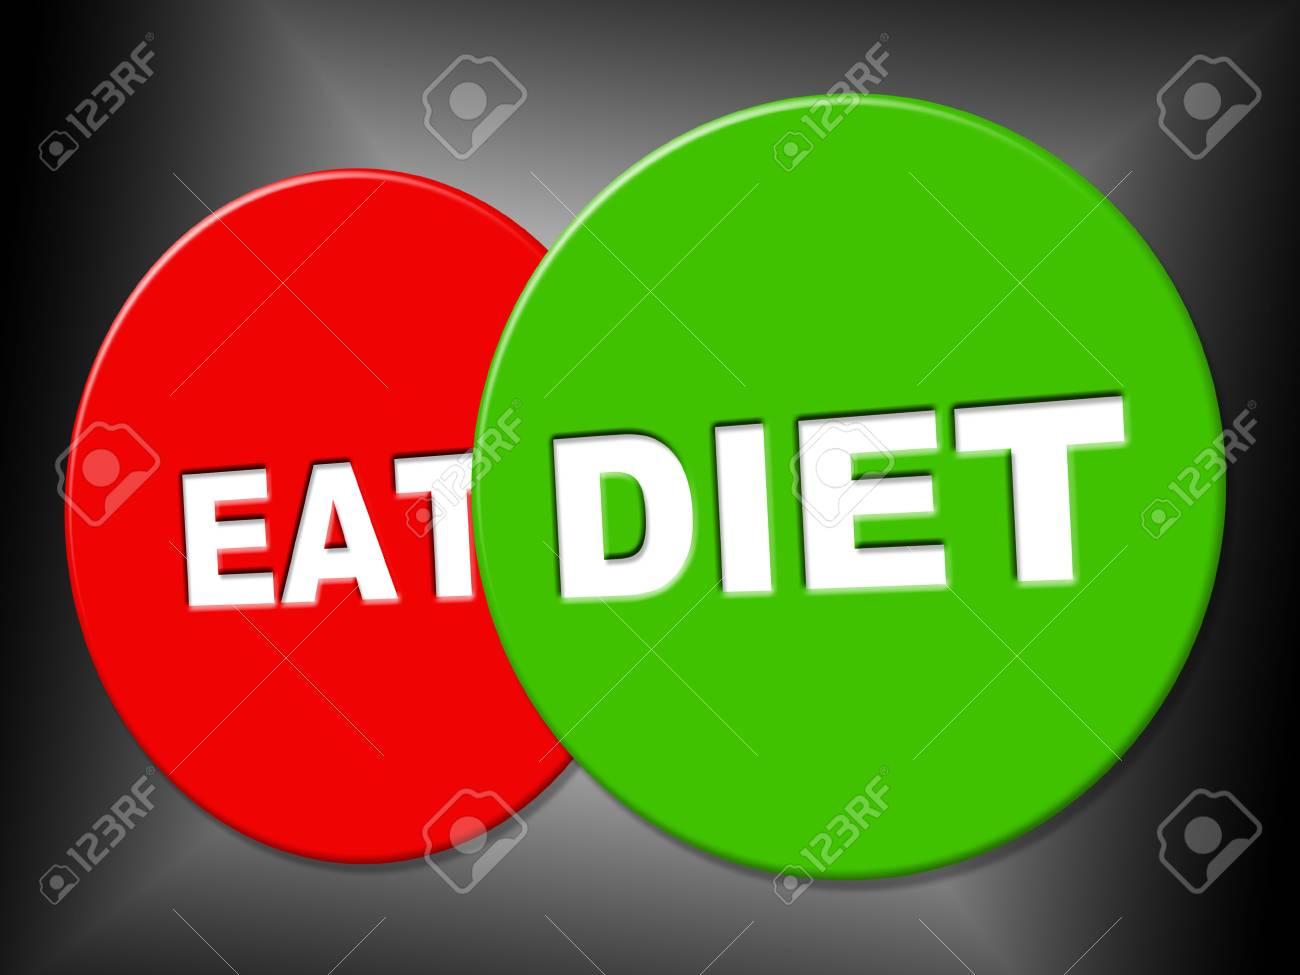 como va la dieta meaning